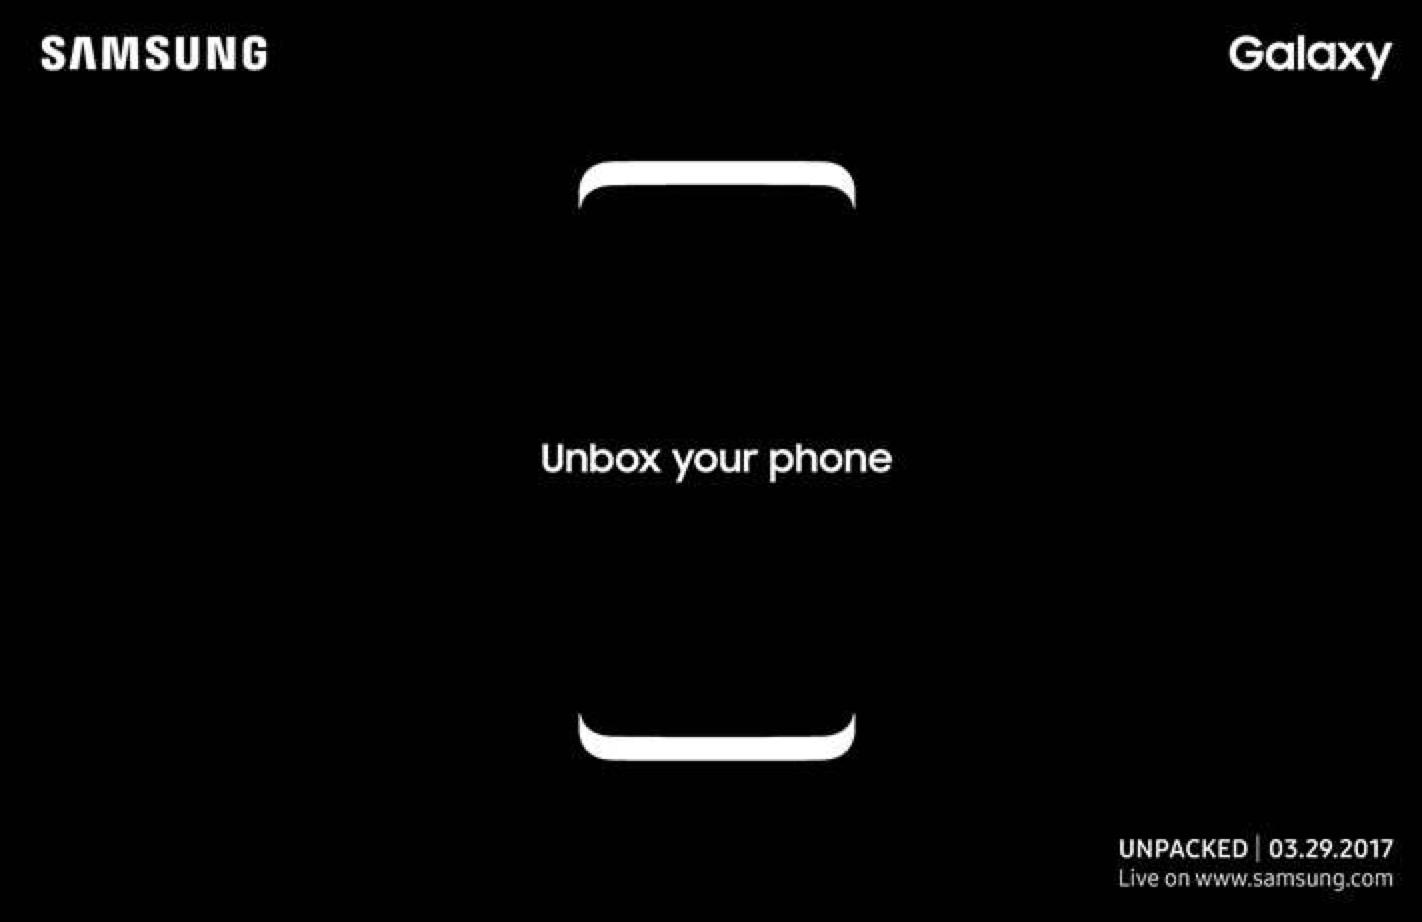 Samsung Galaxy S8 launch invitation